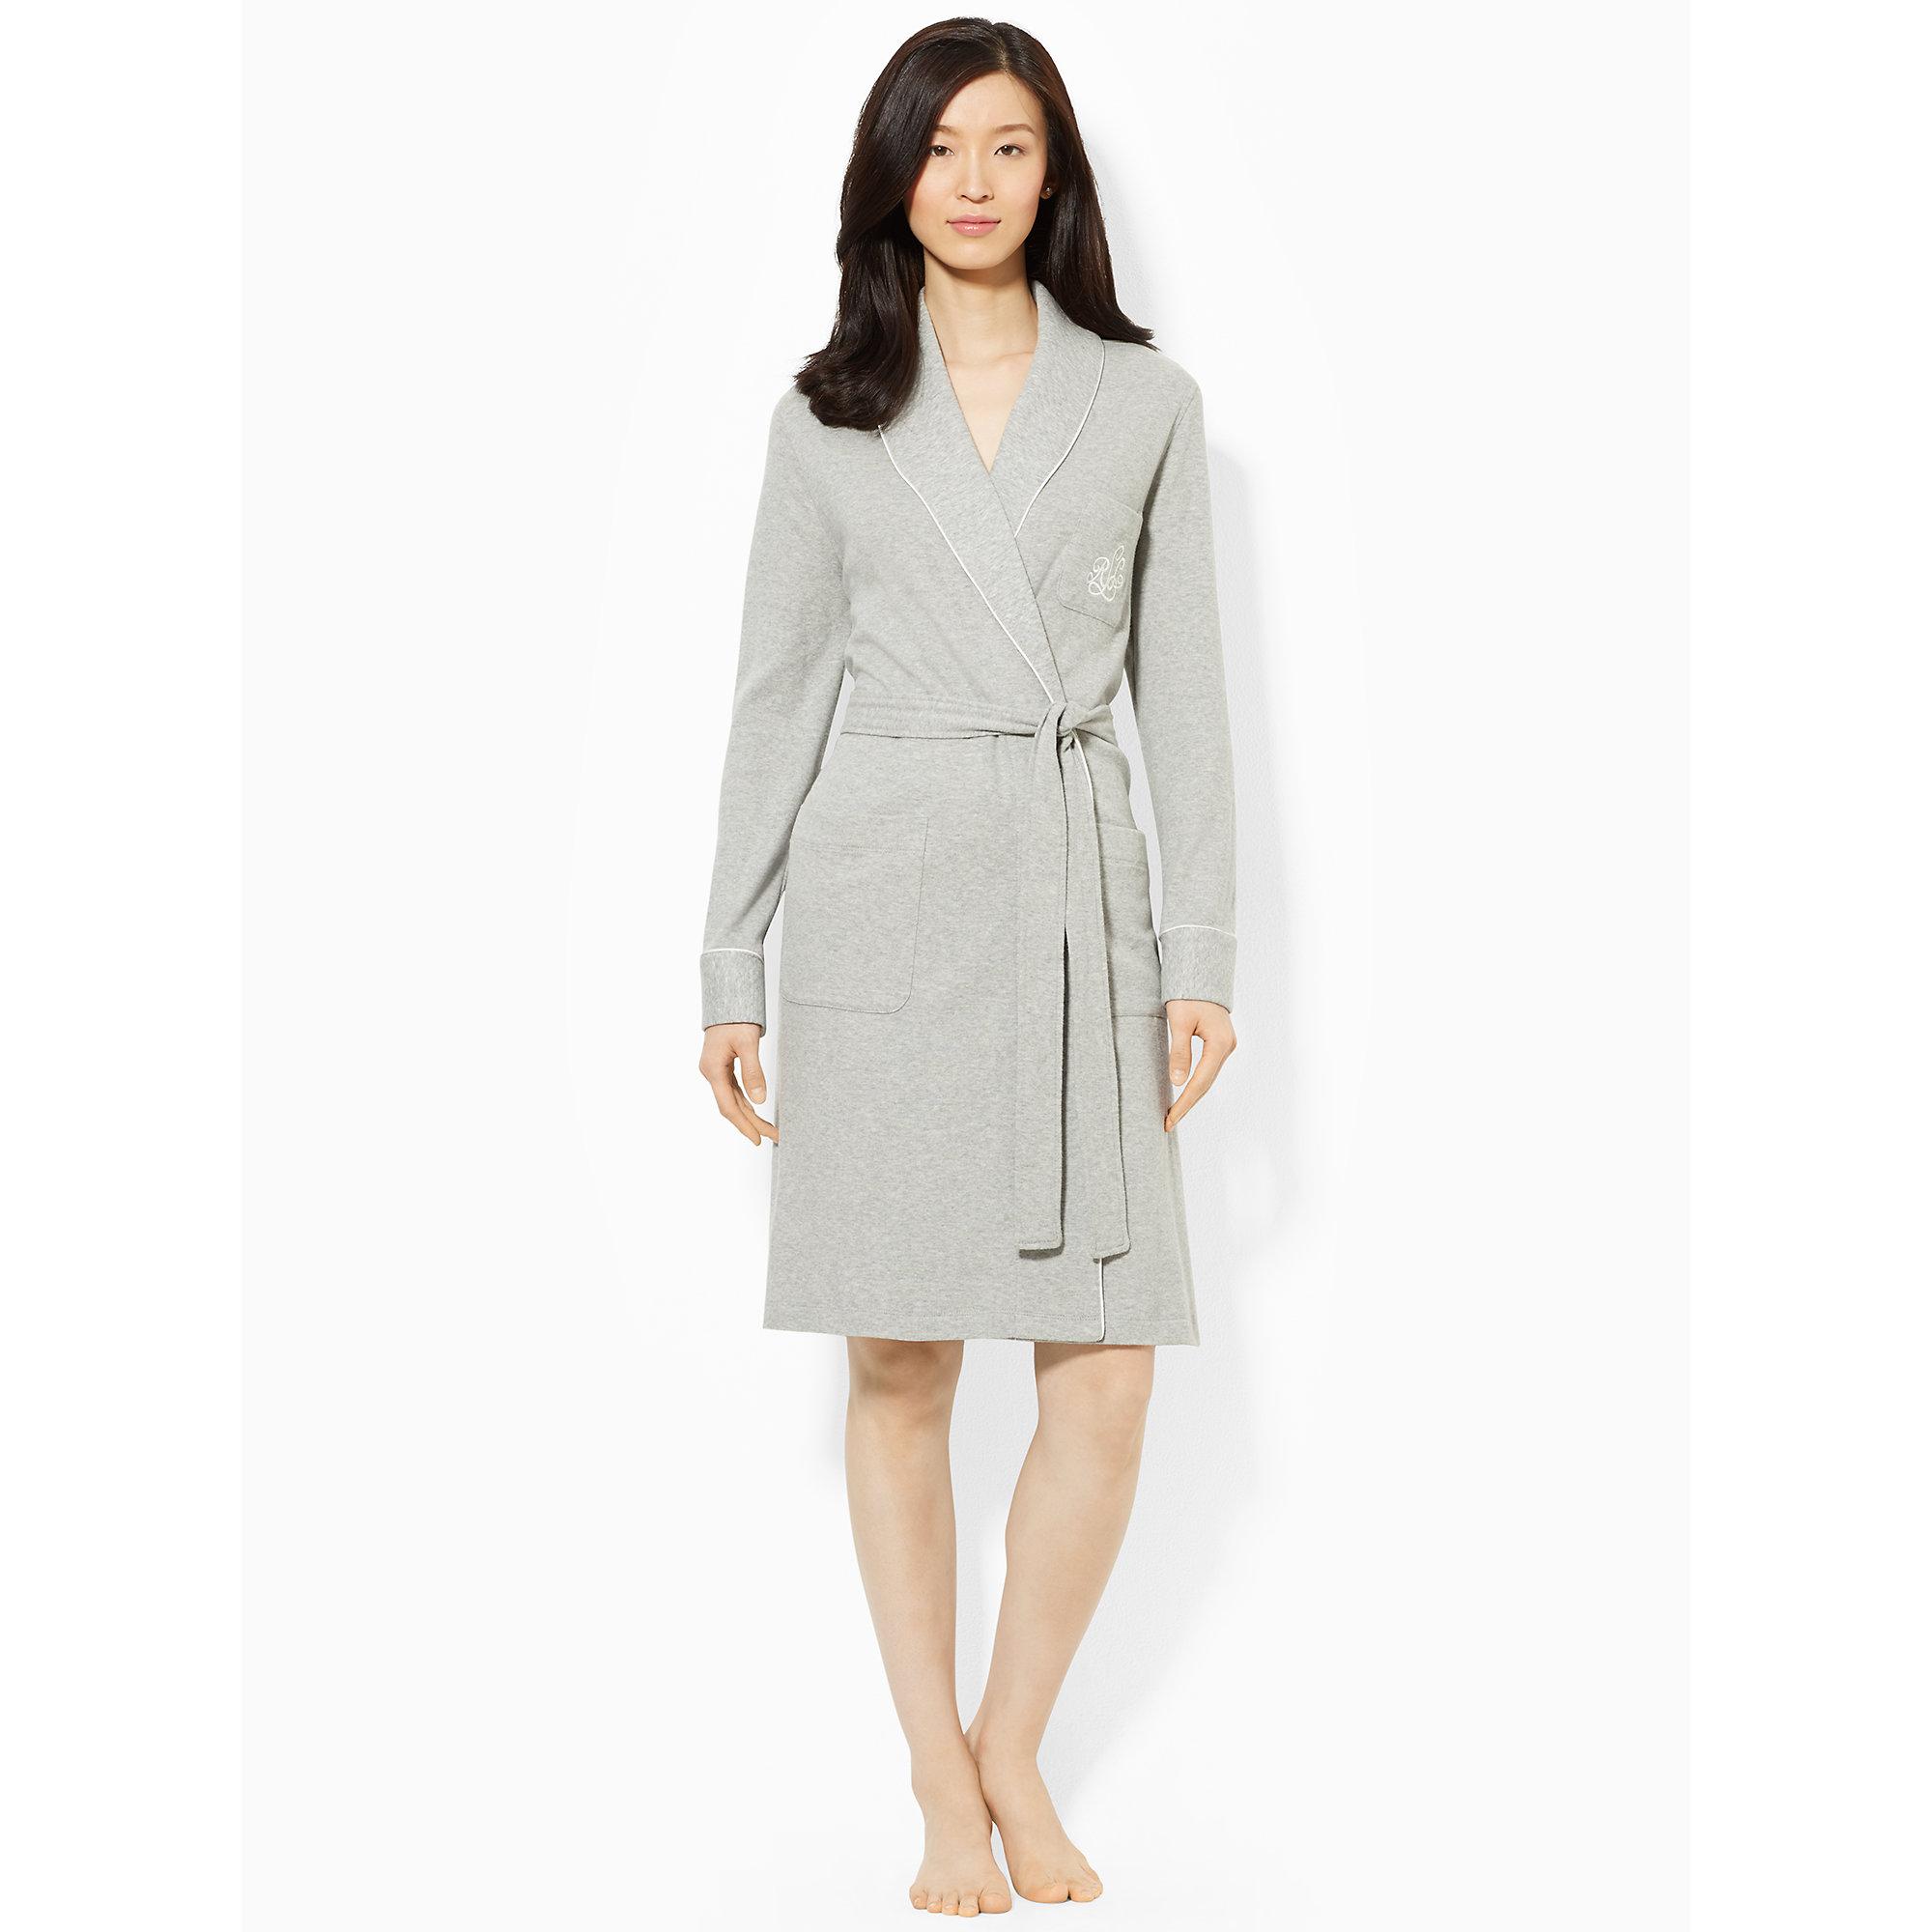 ralph lauren short shawl collar robe in gray grey heather lyst. Black Bedroom Furniture Sets. Home Design Ideas